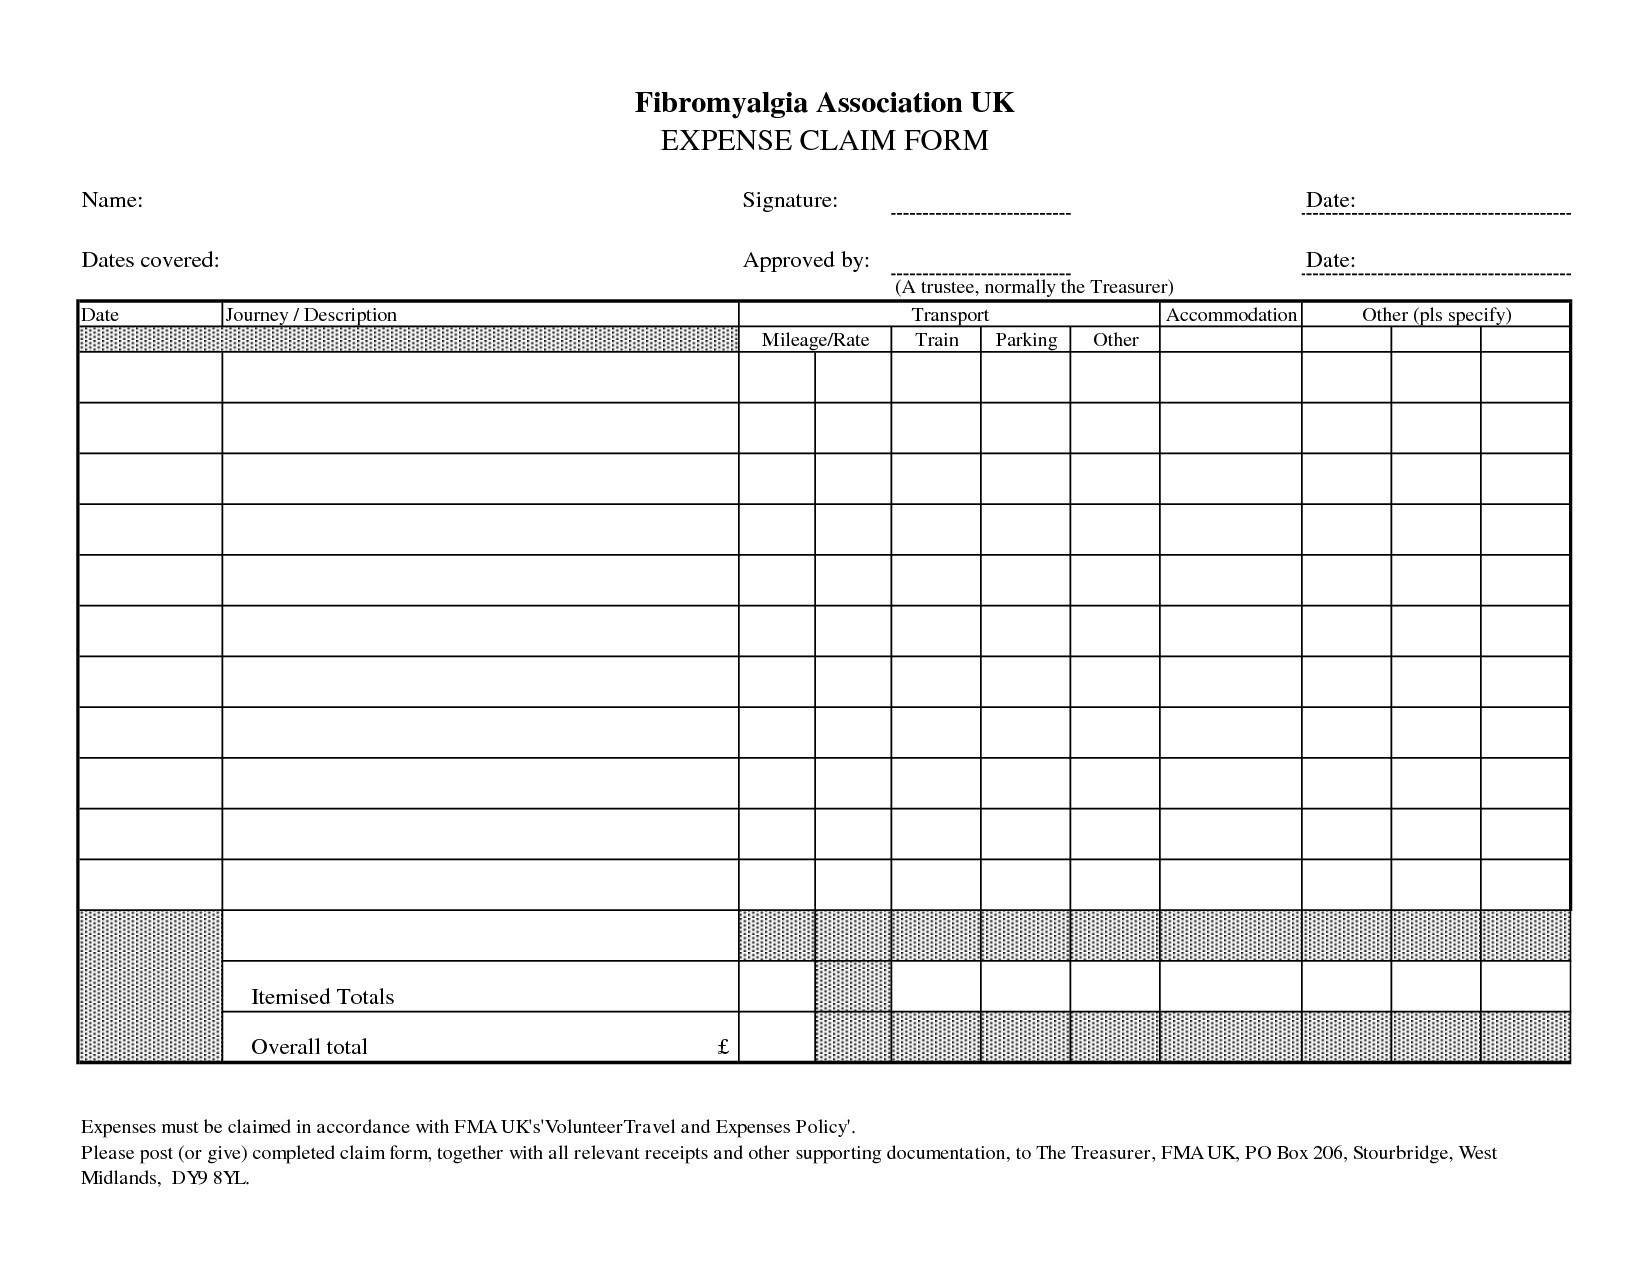 Renovation Spreadsheet Home Renovation Budget Spreadsheet Template Renovation Spreadsheet